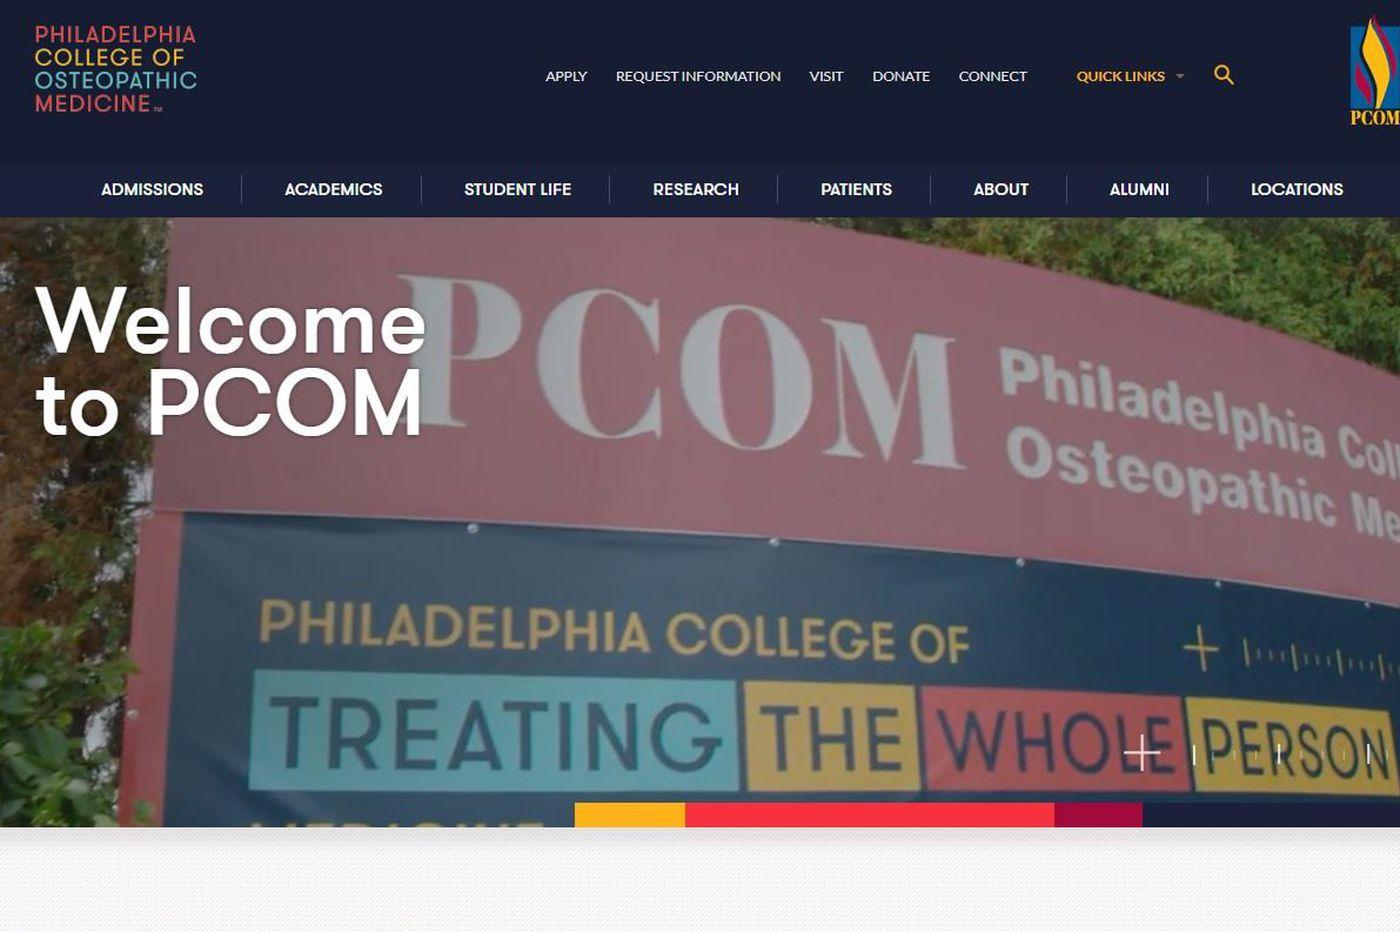 PCOM to open medical school in Georgia